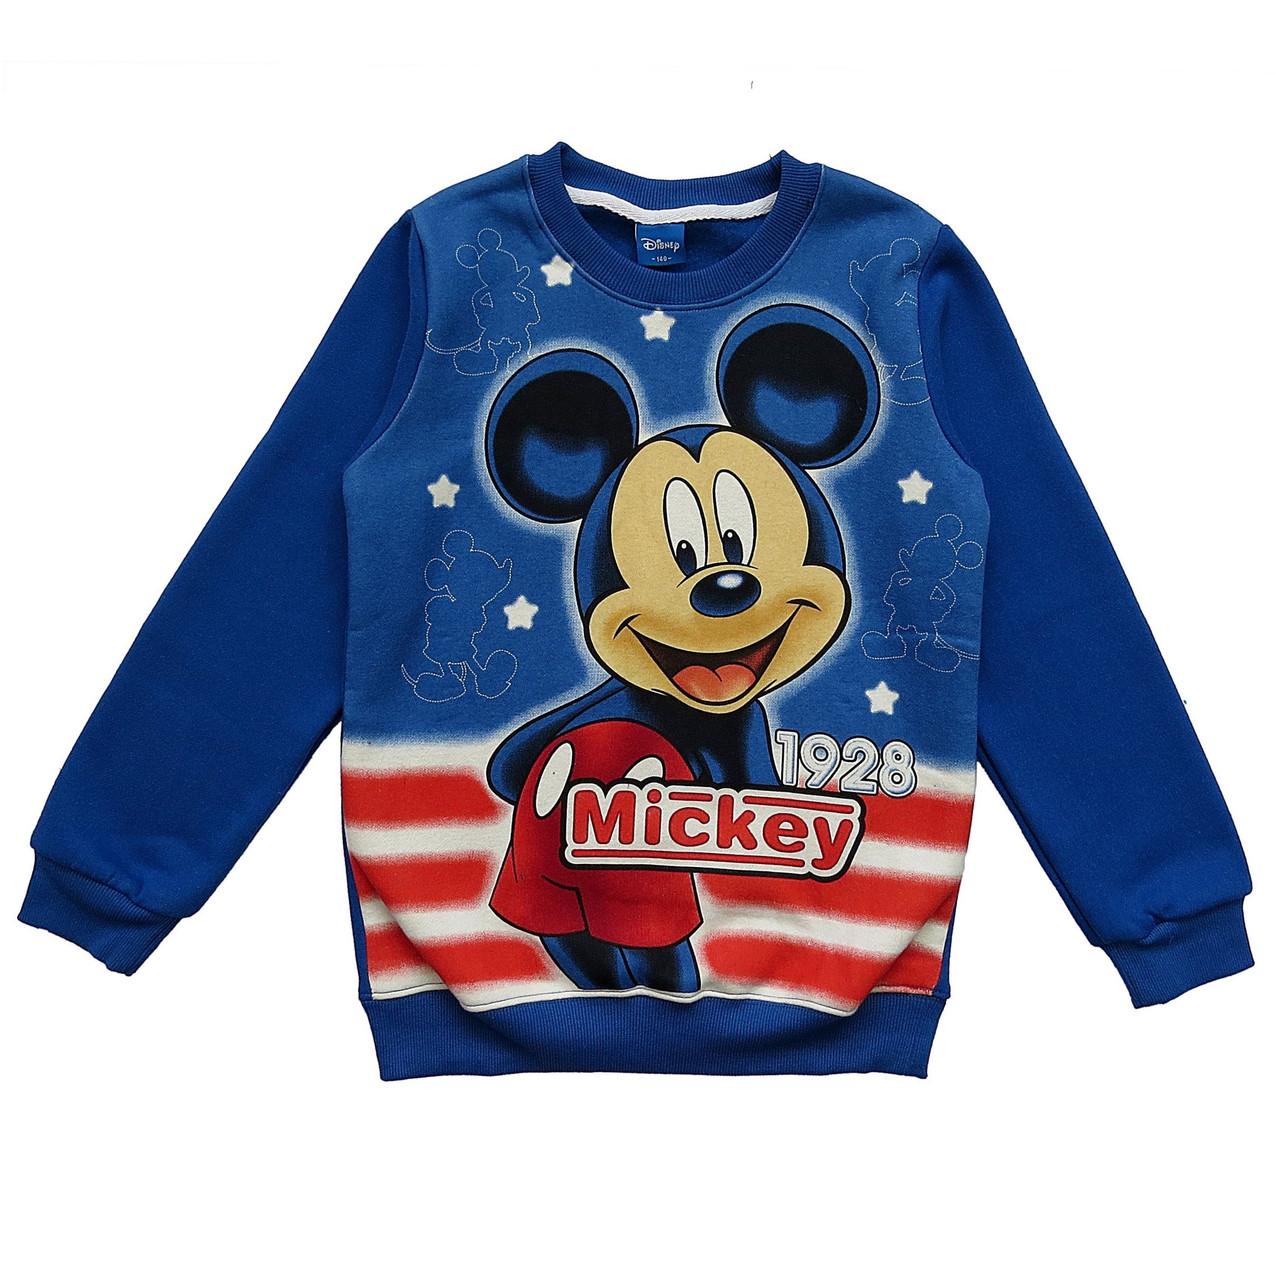 Теплый свитшот Mickey Mouse для мальчика.